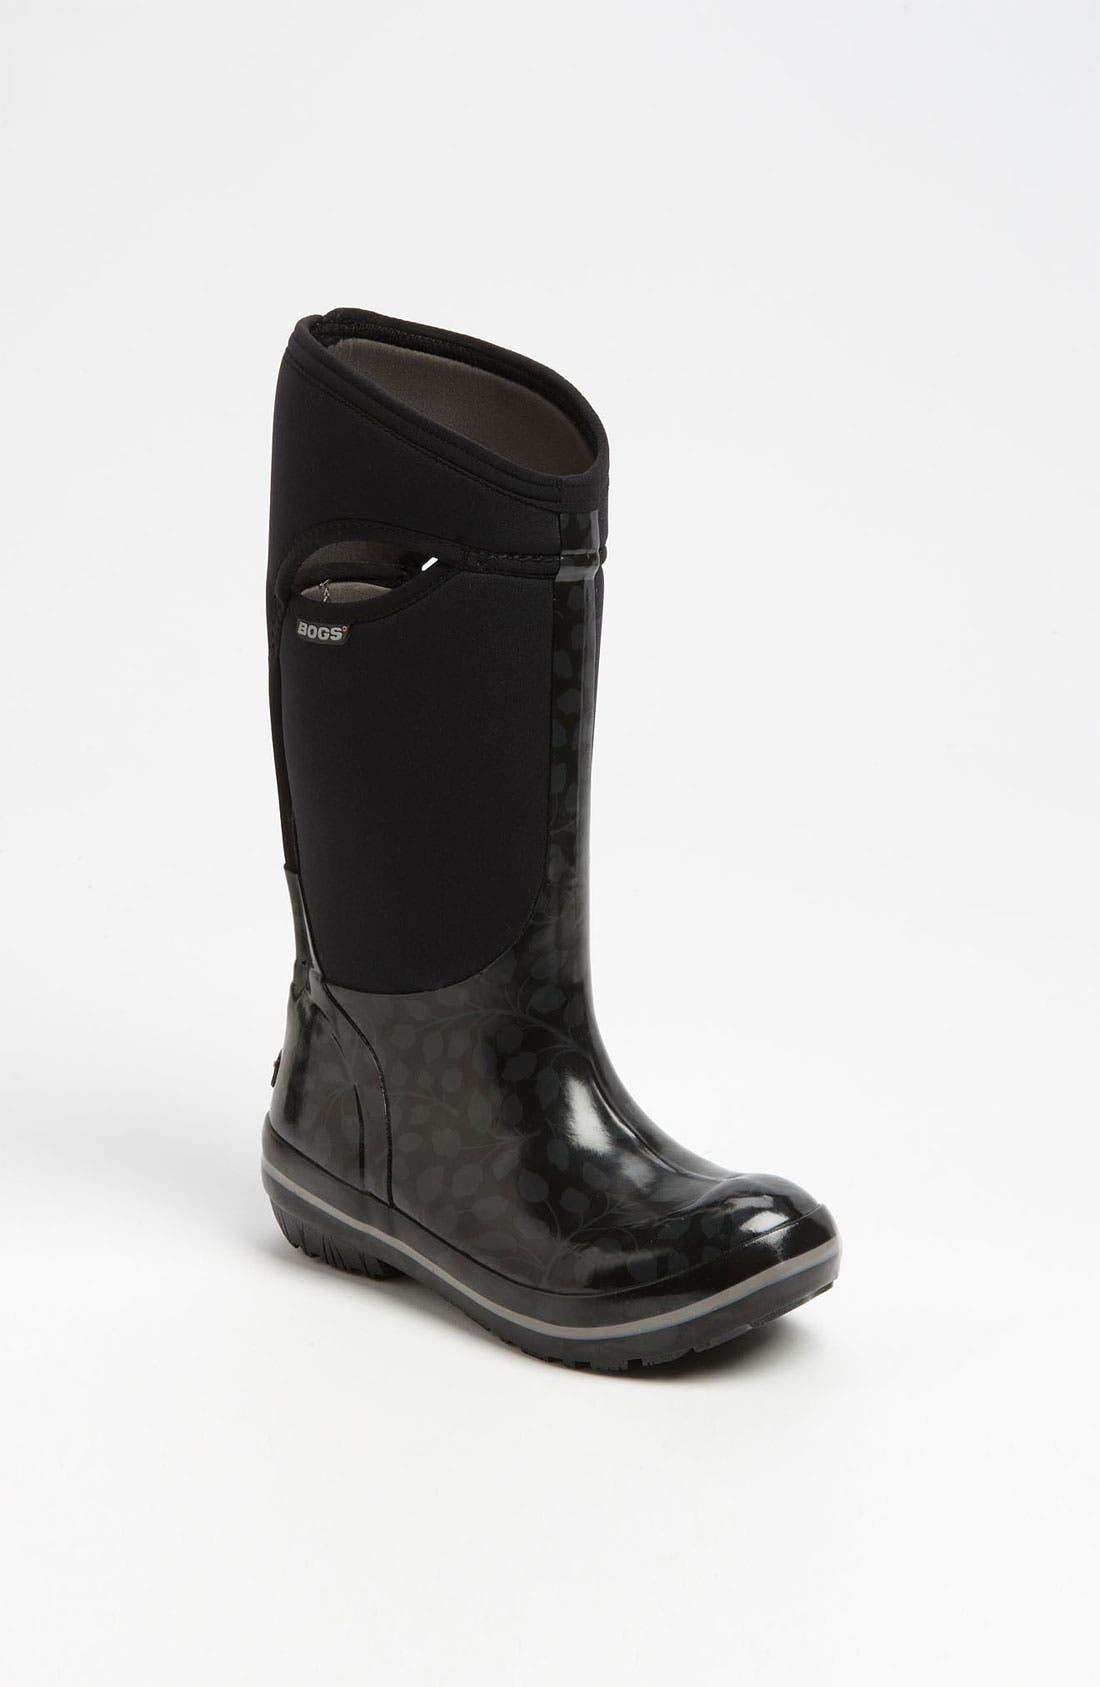 Alternate Image 1 Selected - Bogs 'Plimsoll Tall Leaf' Rain Boot (Women)